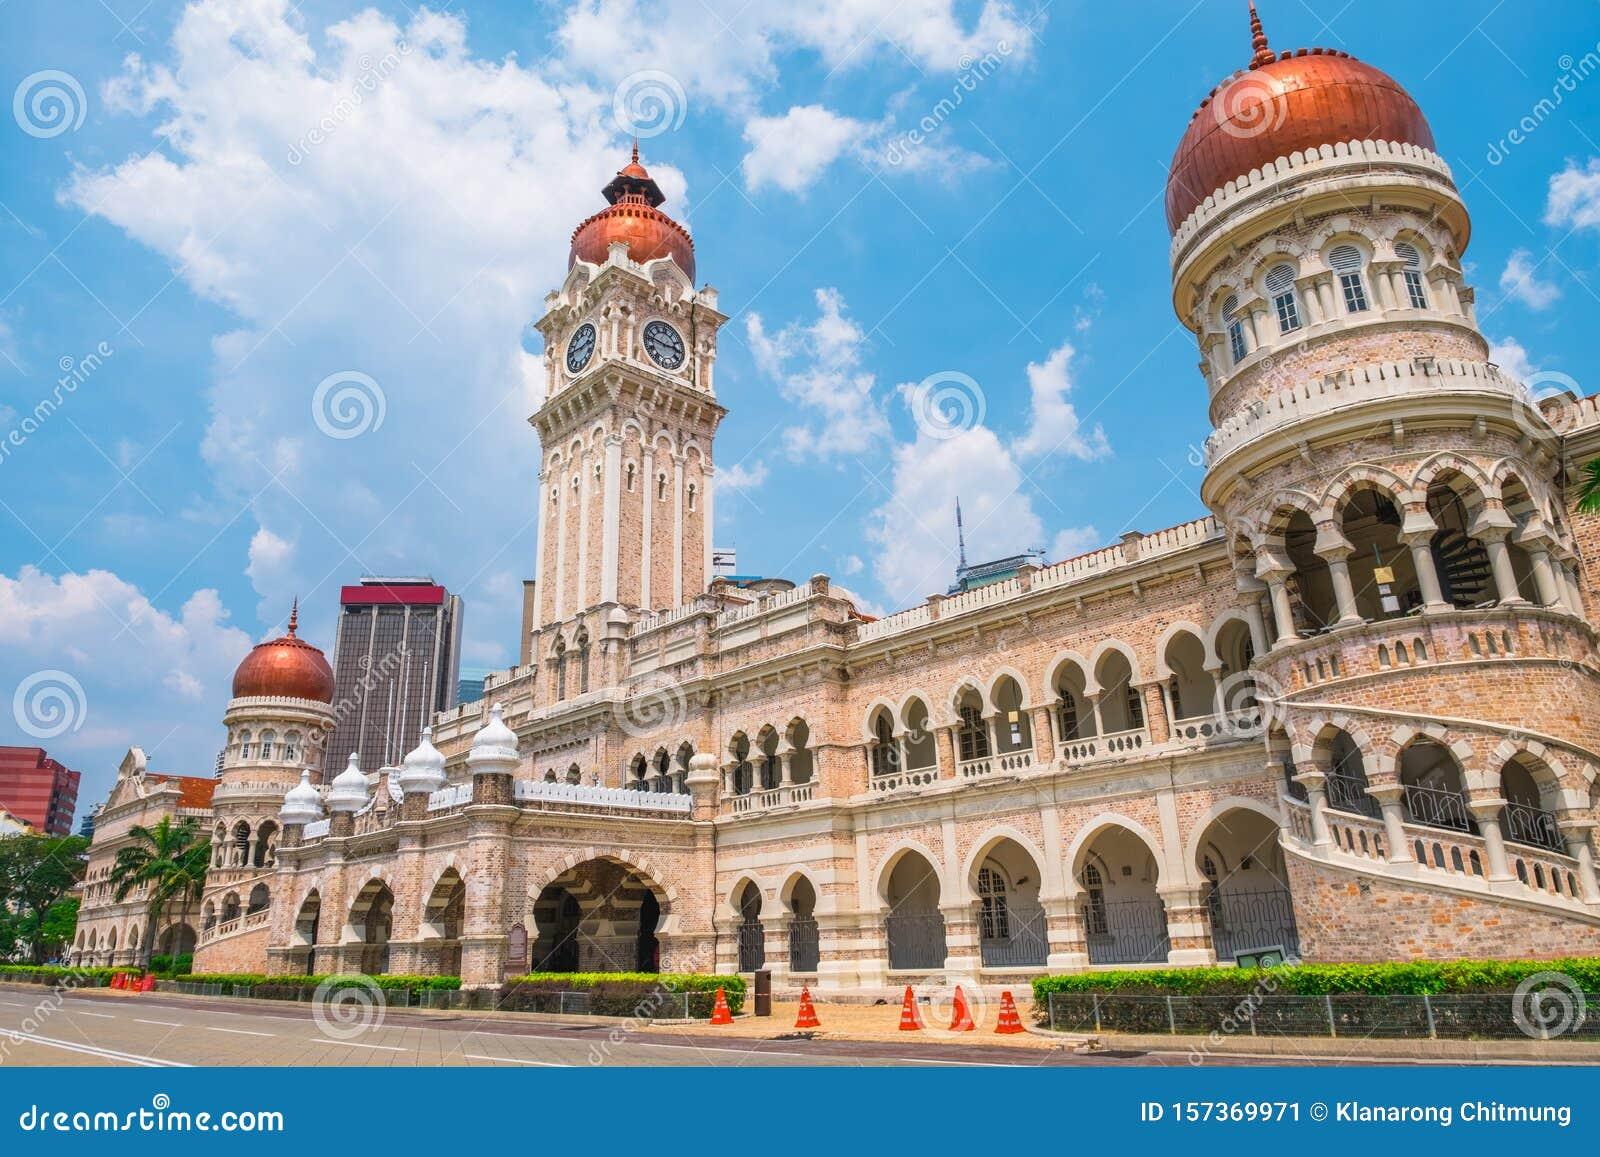 Malaysia, Dataran Merdeka